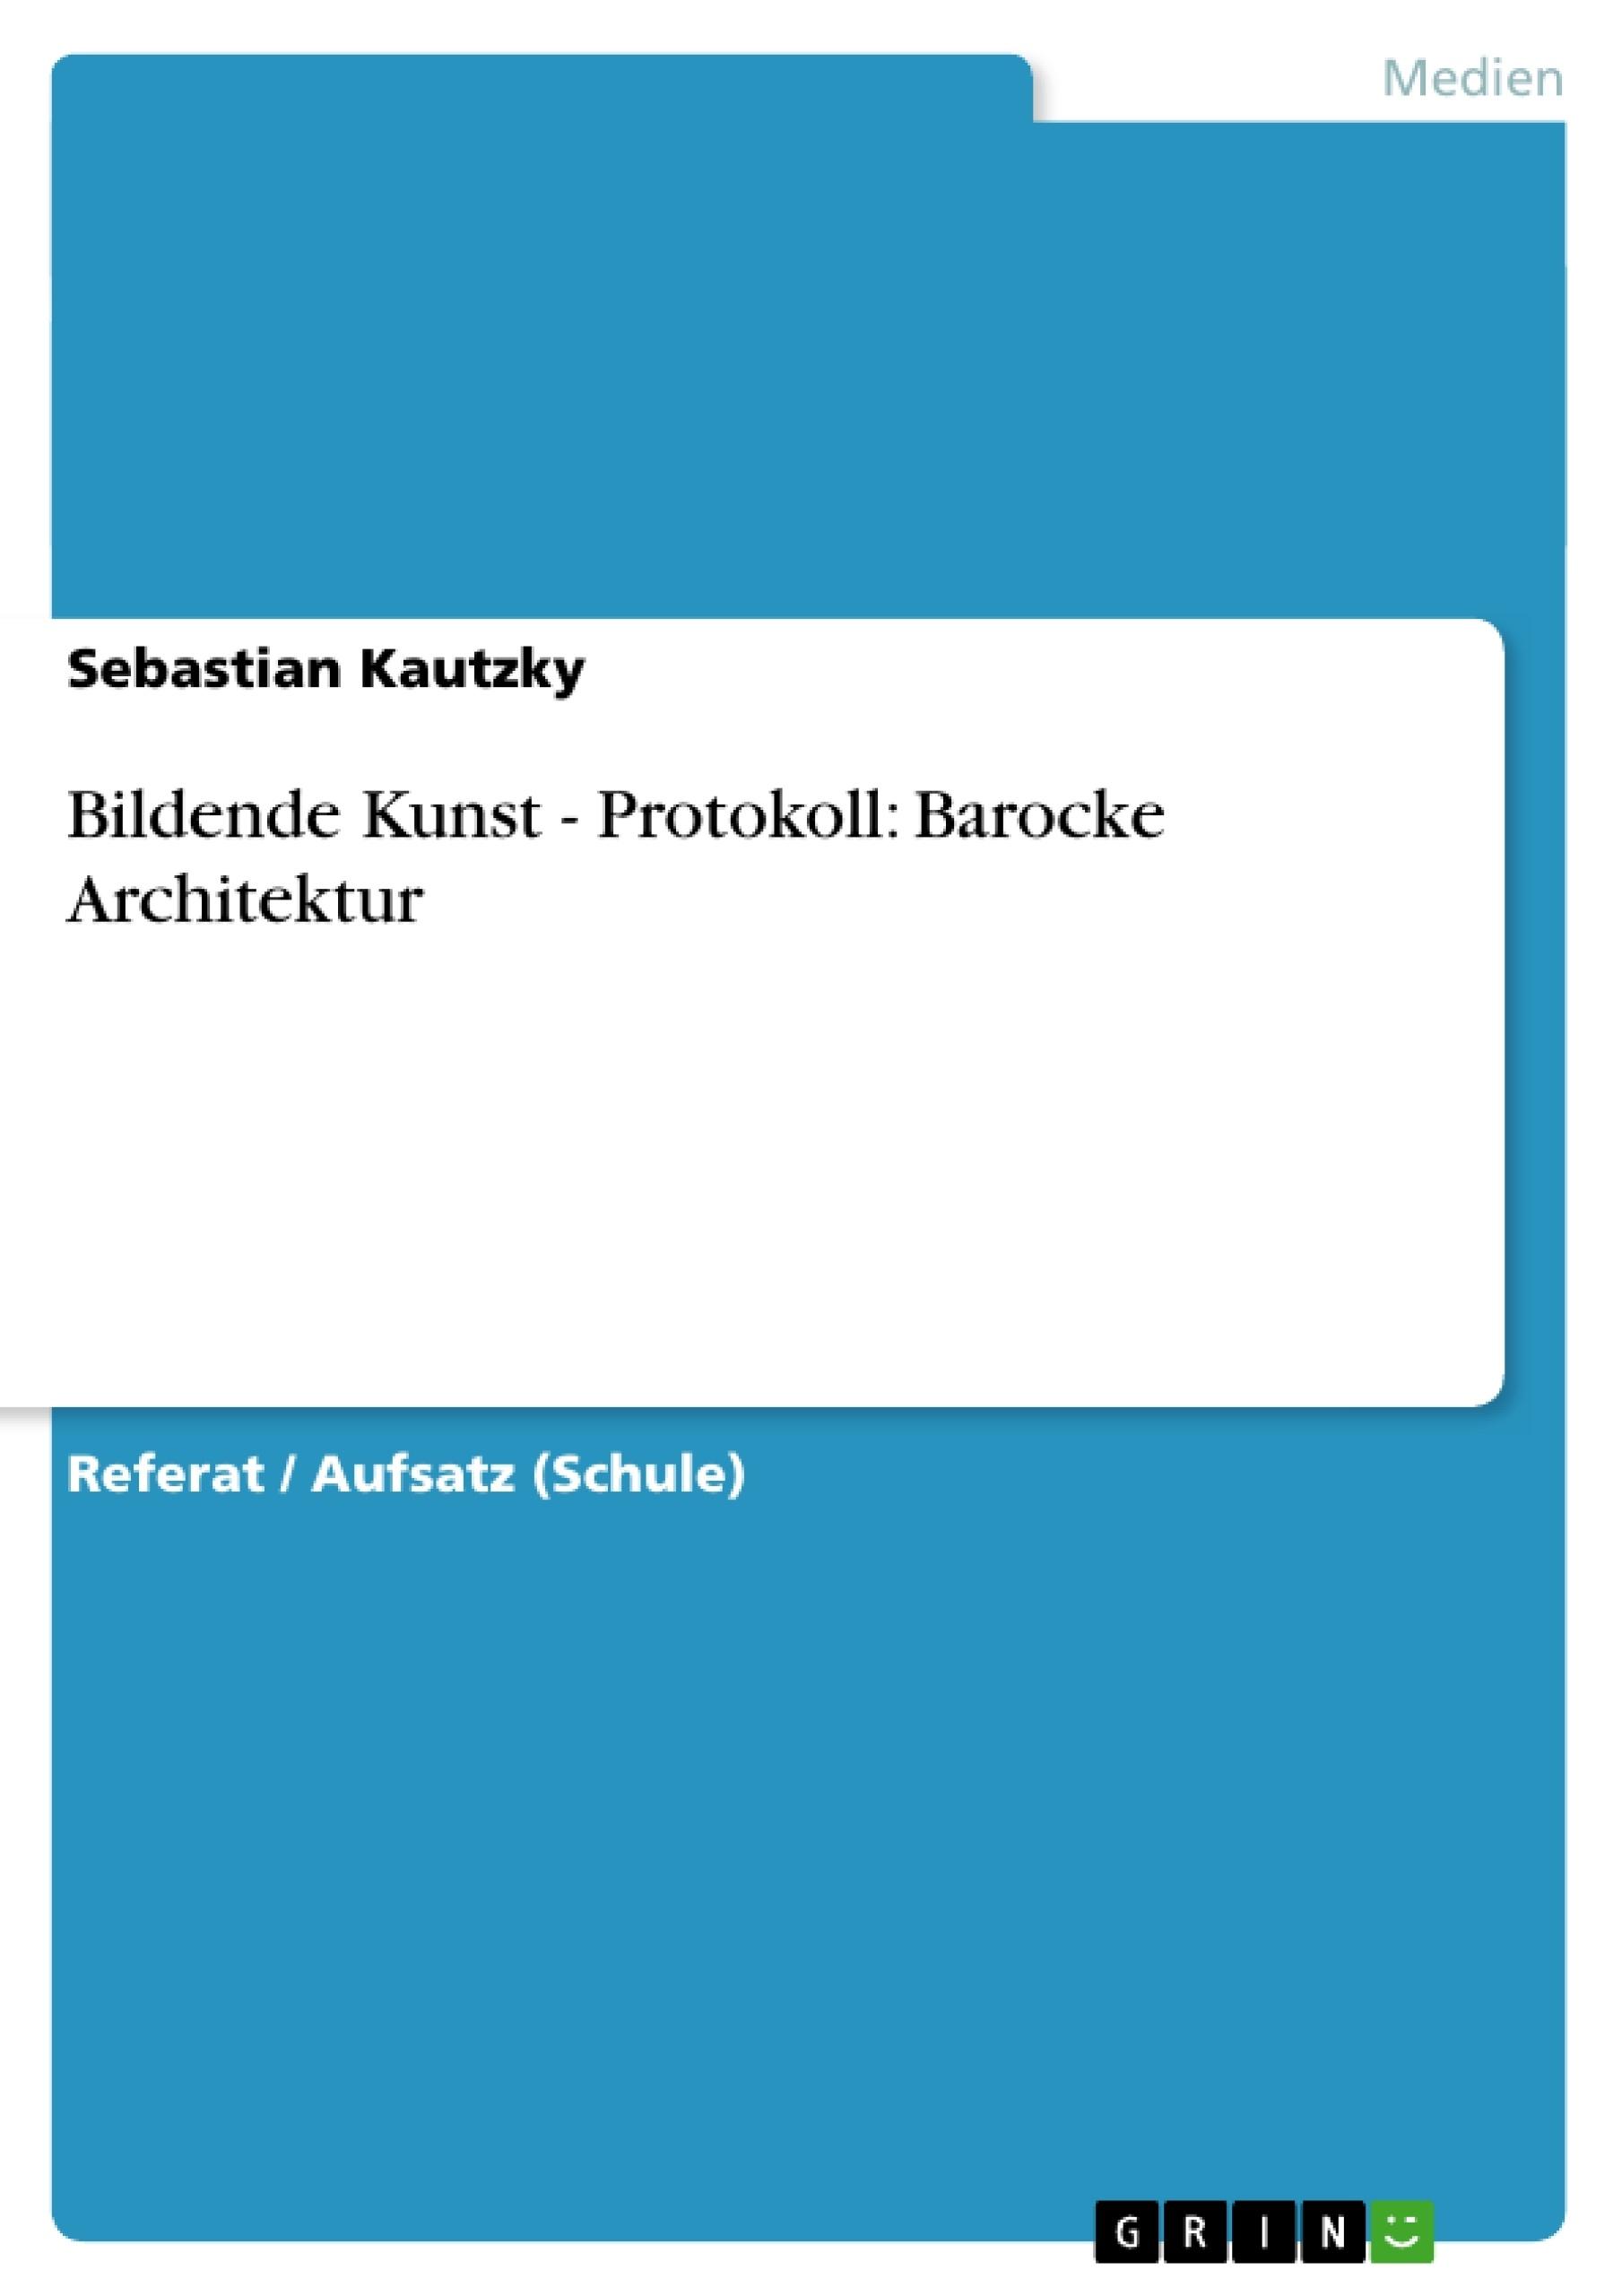 Titel: Bildende Kunst - Protokoll: Barocke Architektur